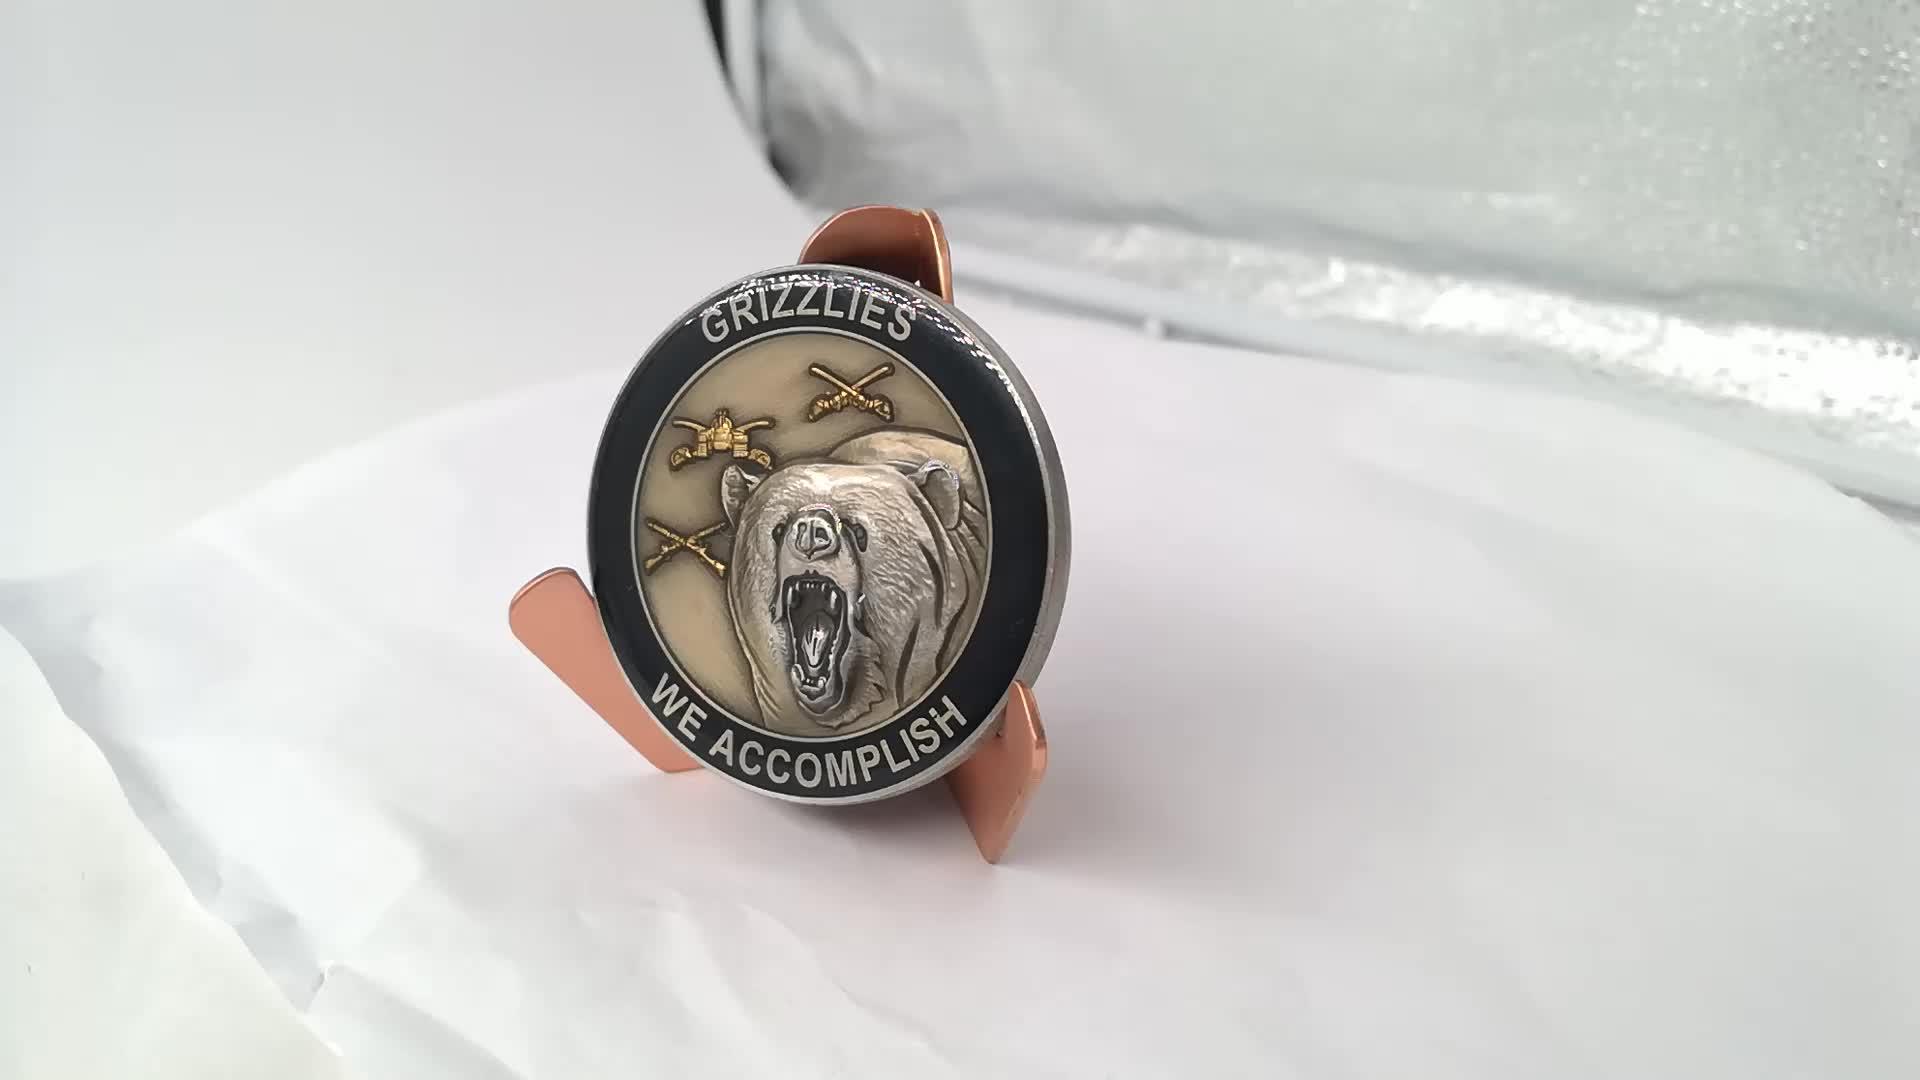 Hot sale custom antiqu logo sale old metal souvenir challenge coin